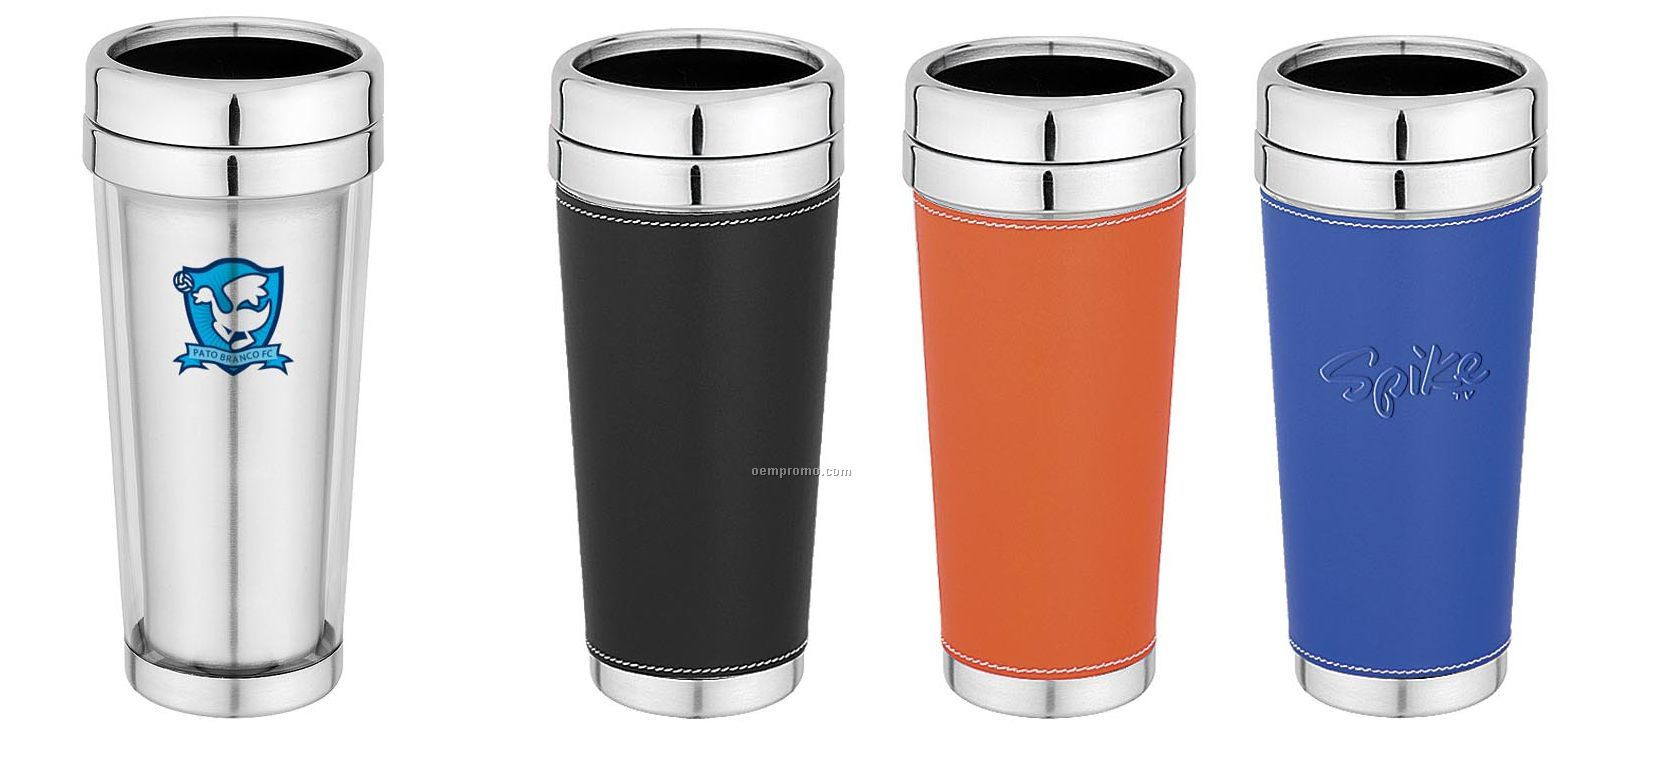 Travel Mug Tumbler 16 Oz Clear Plastic Outer